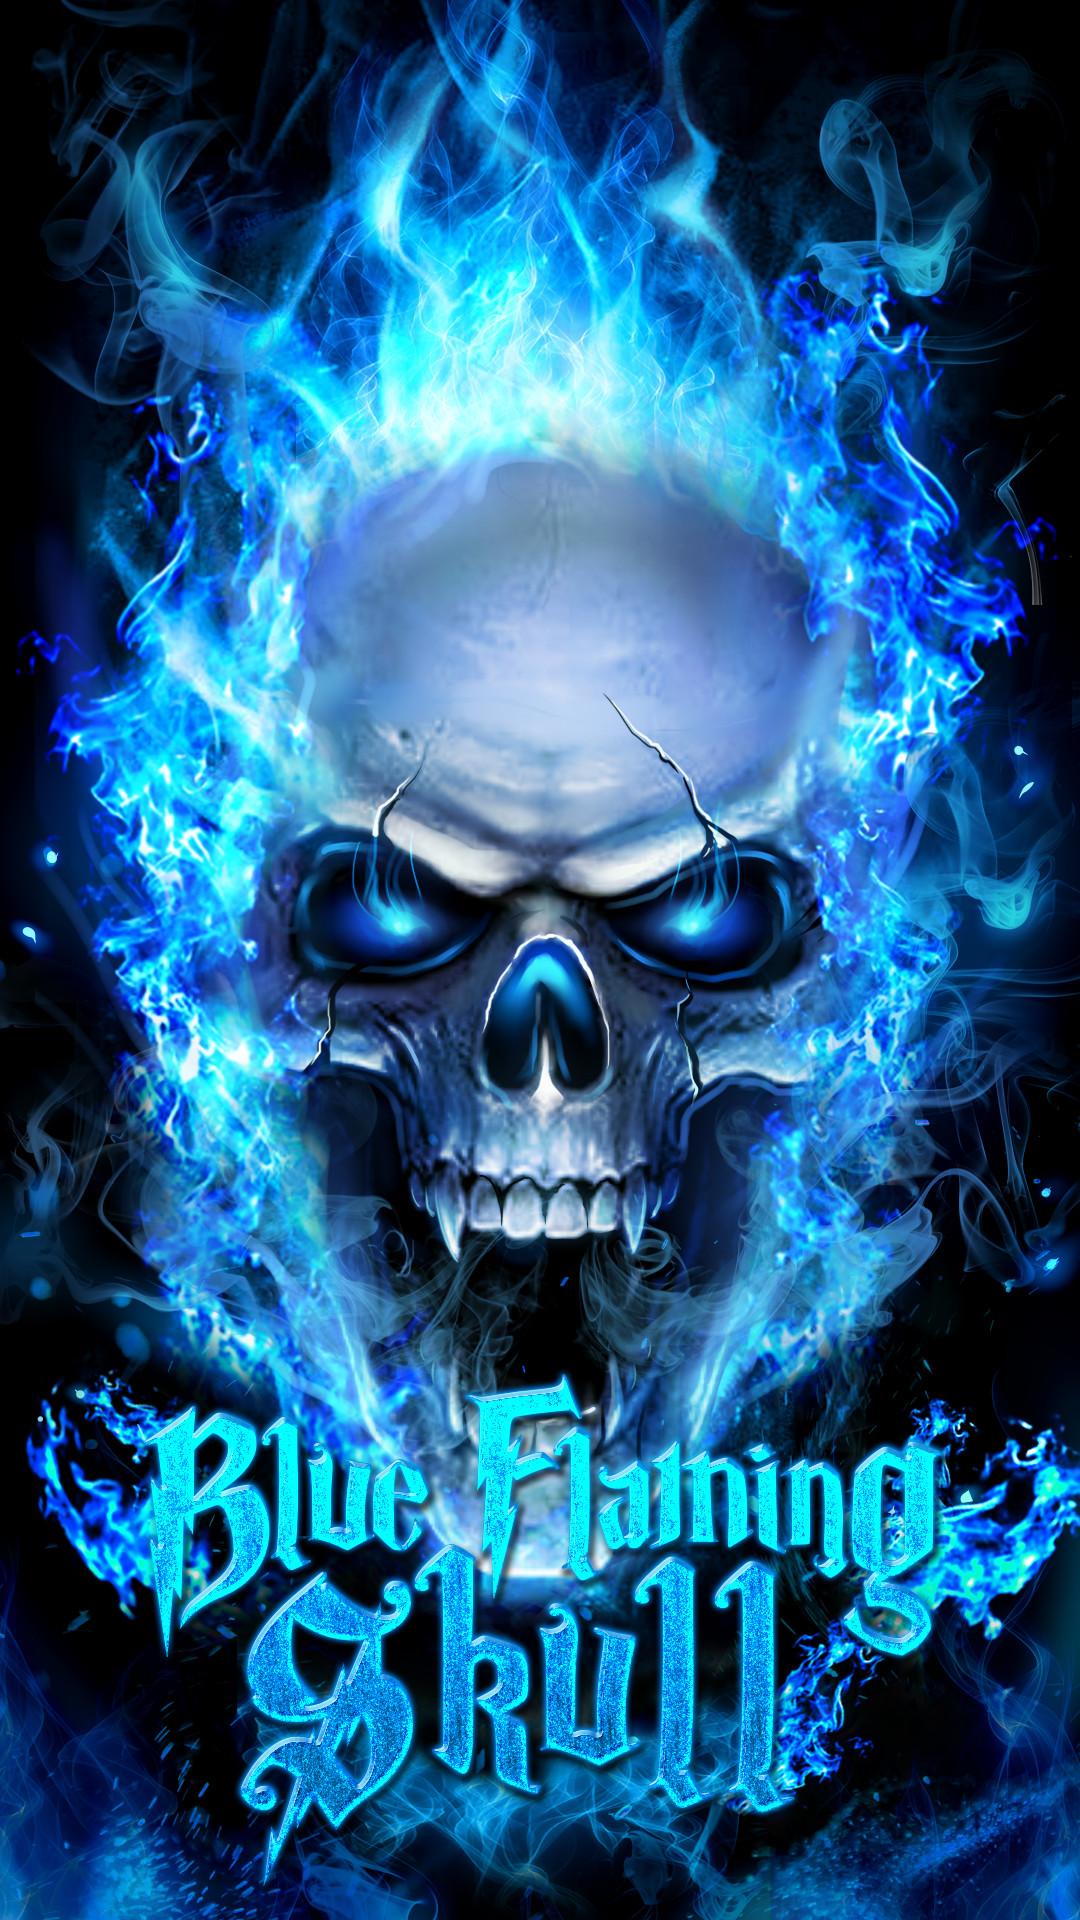 Blue flaming skull live wallpaper!